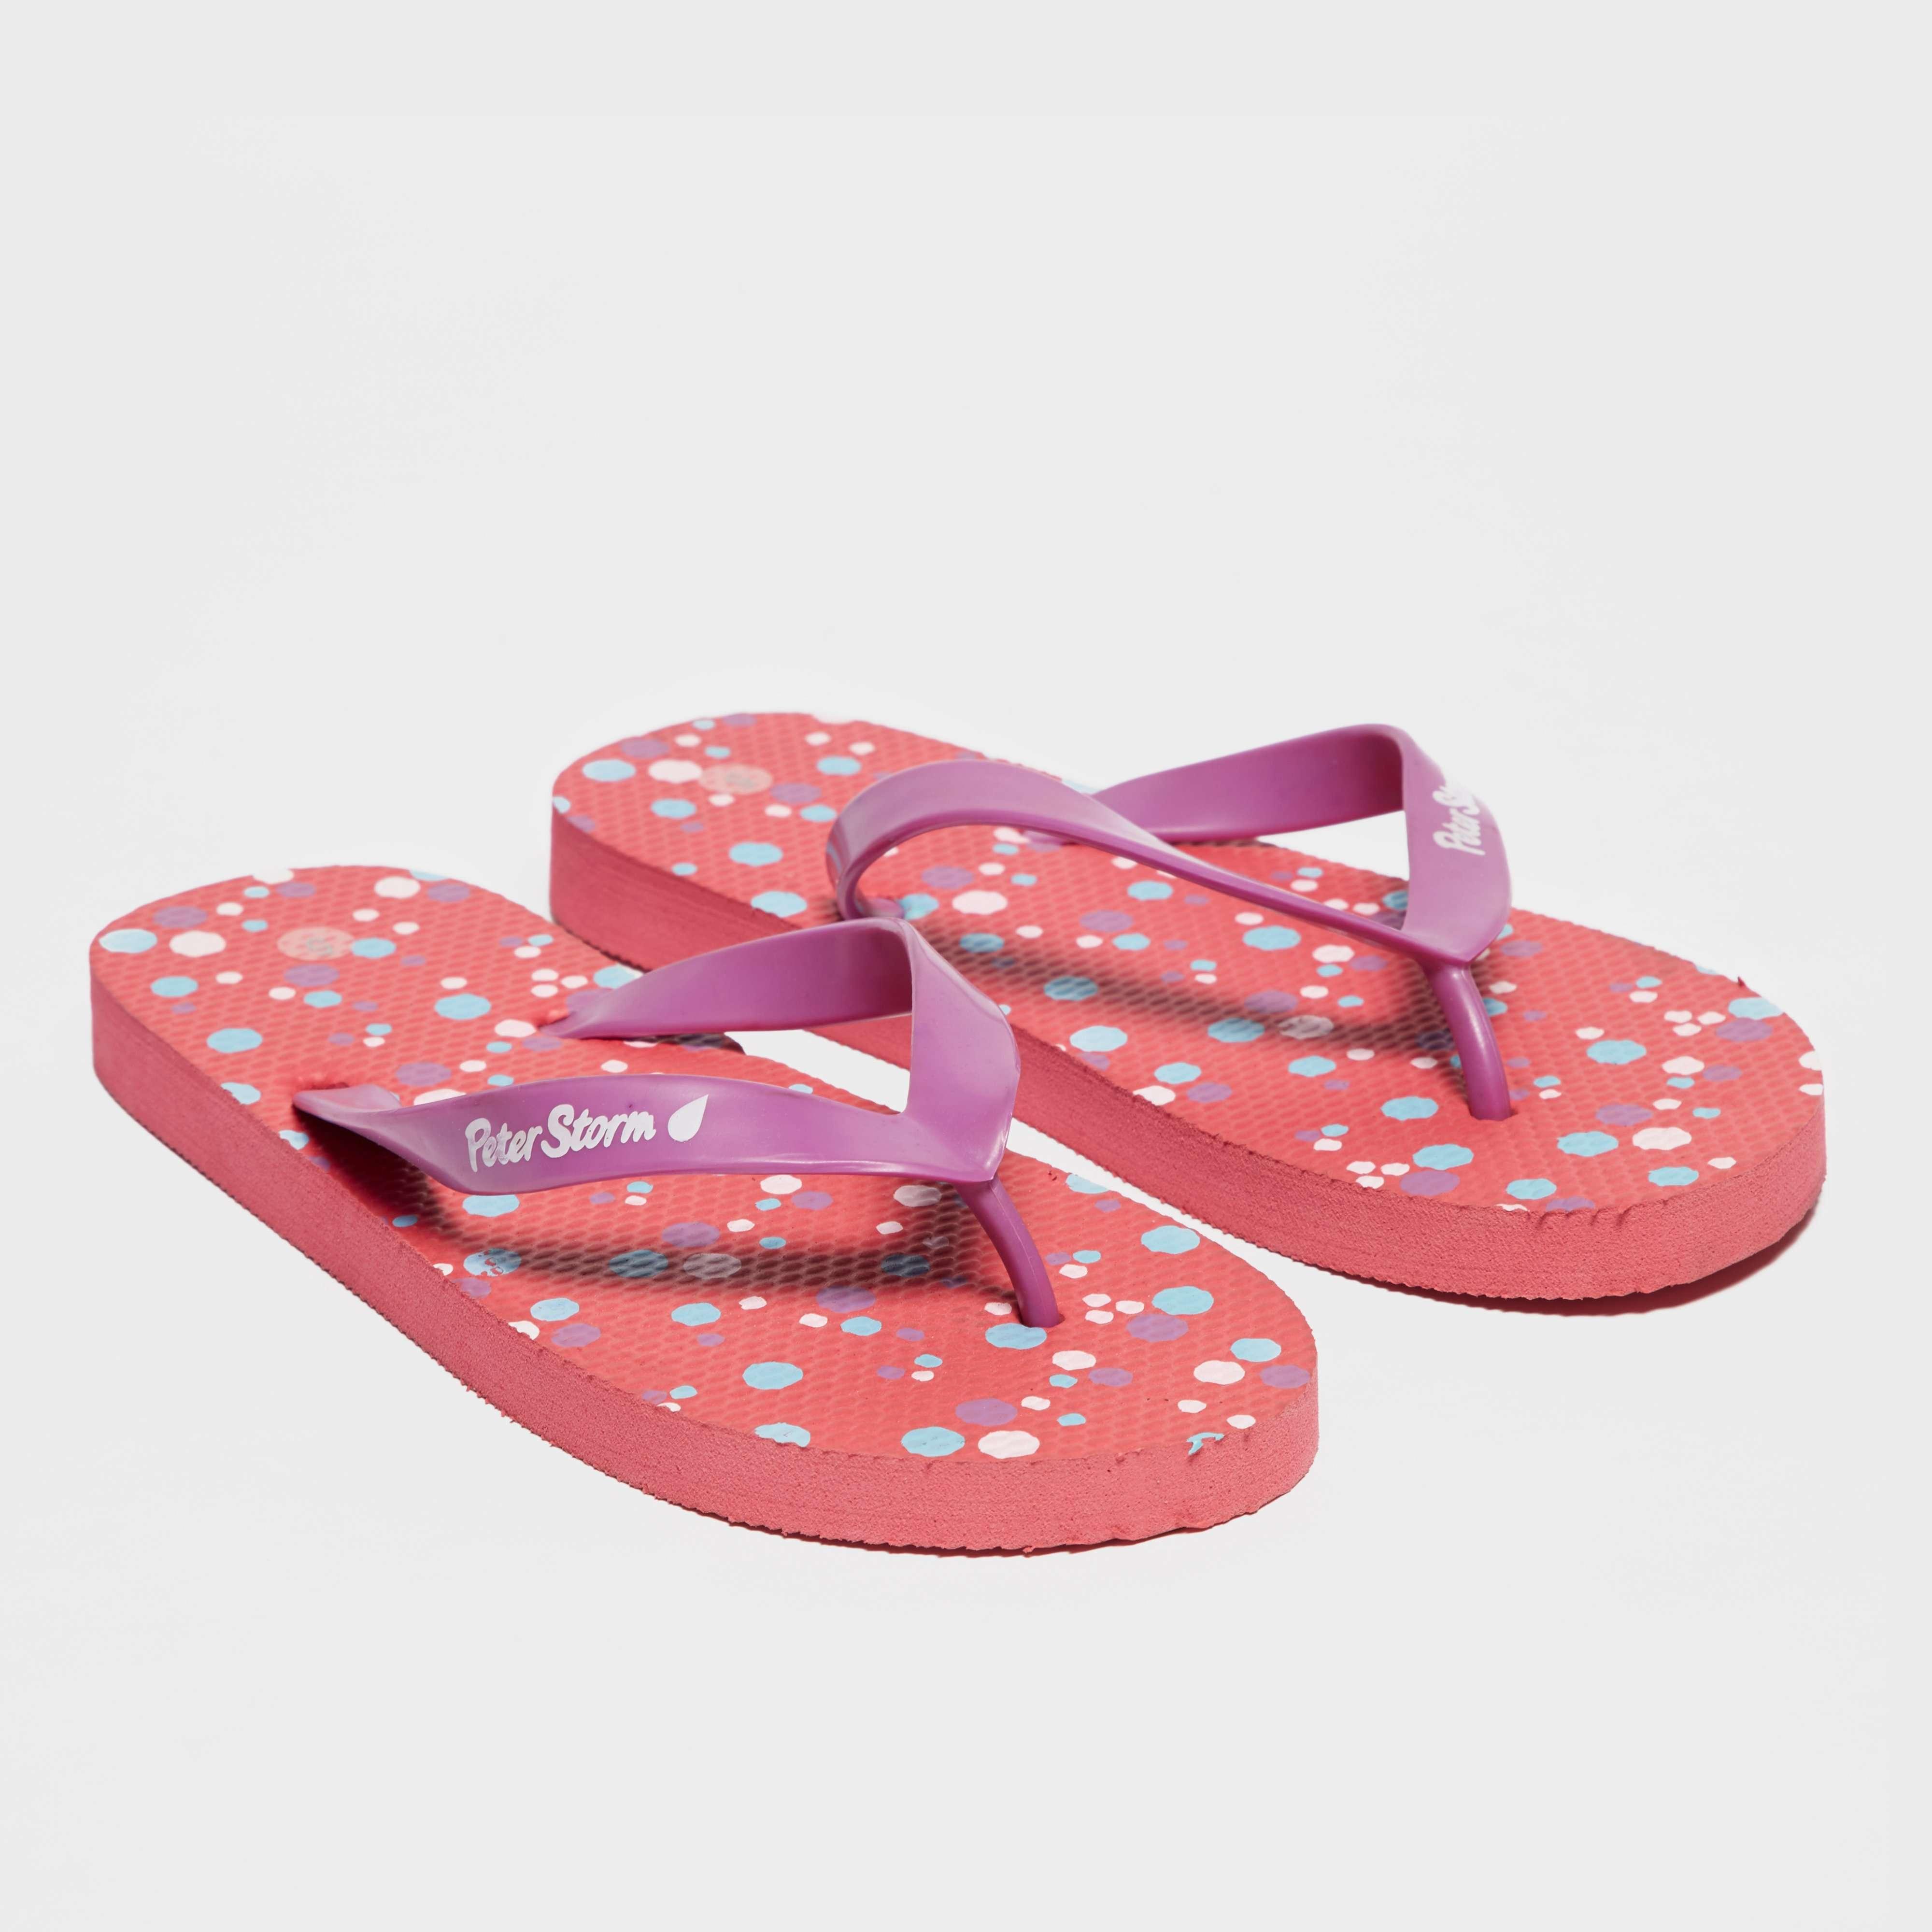 PETER STORM Women's Dotty Flip Flops